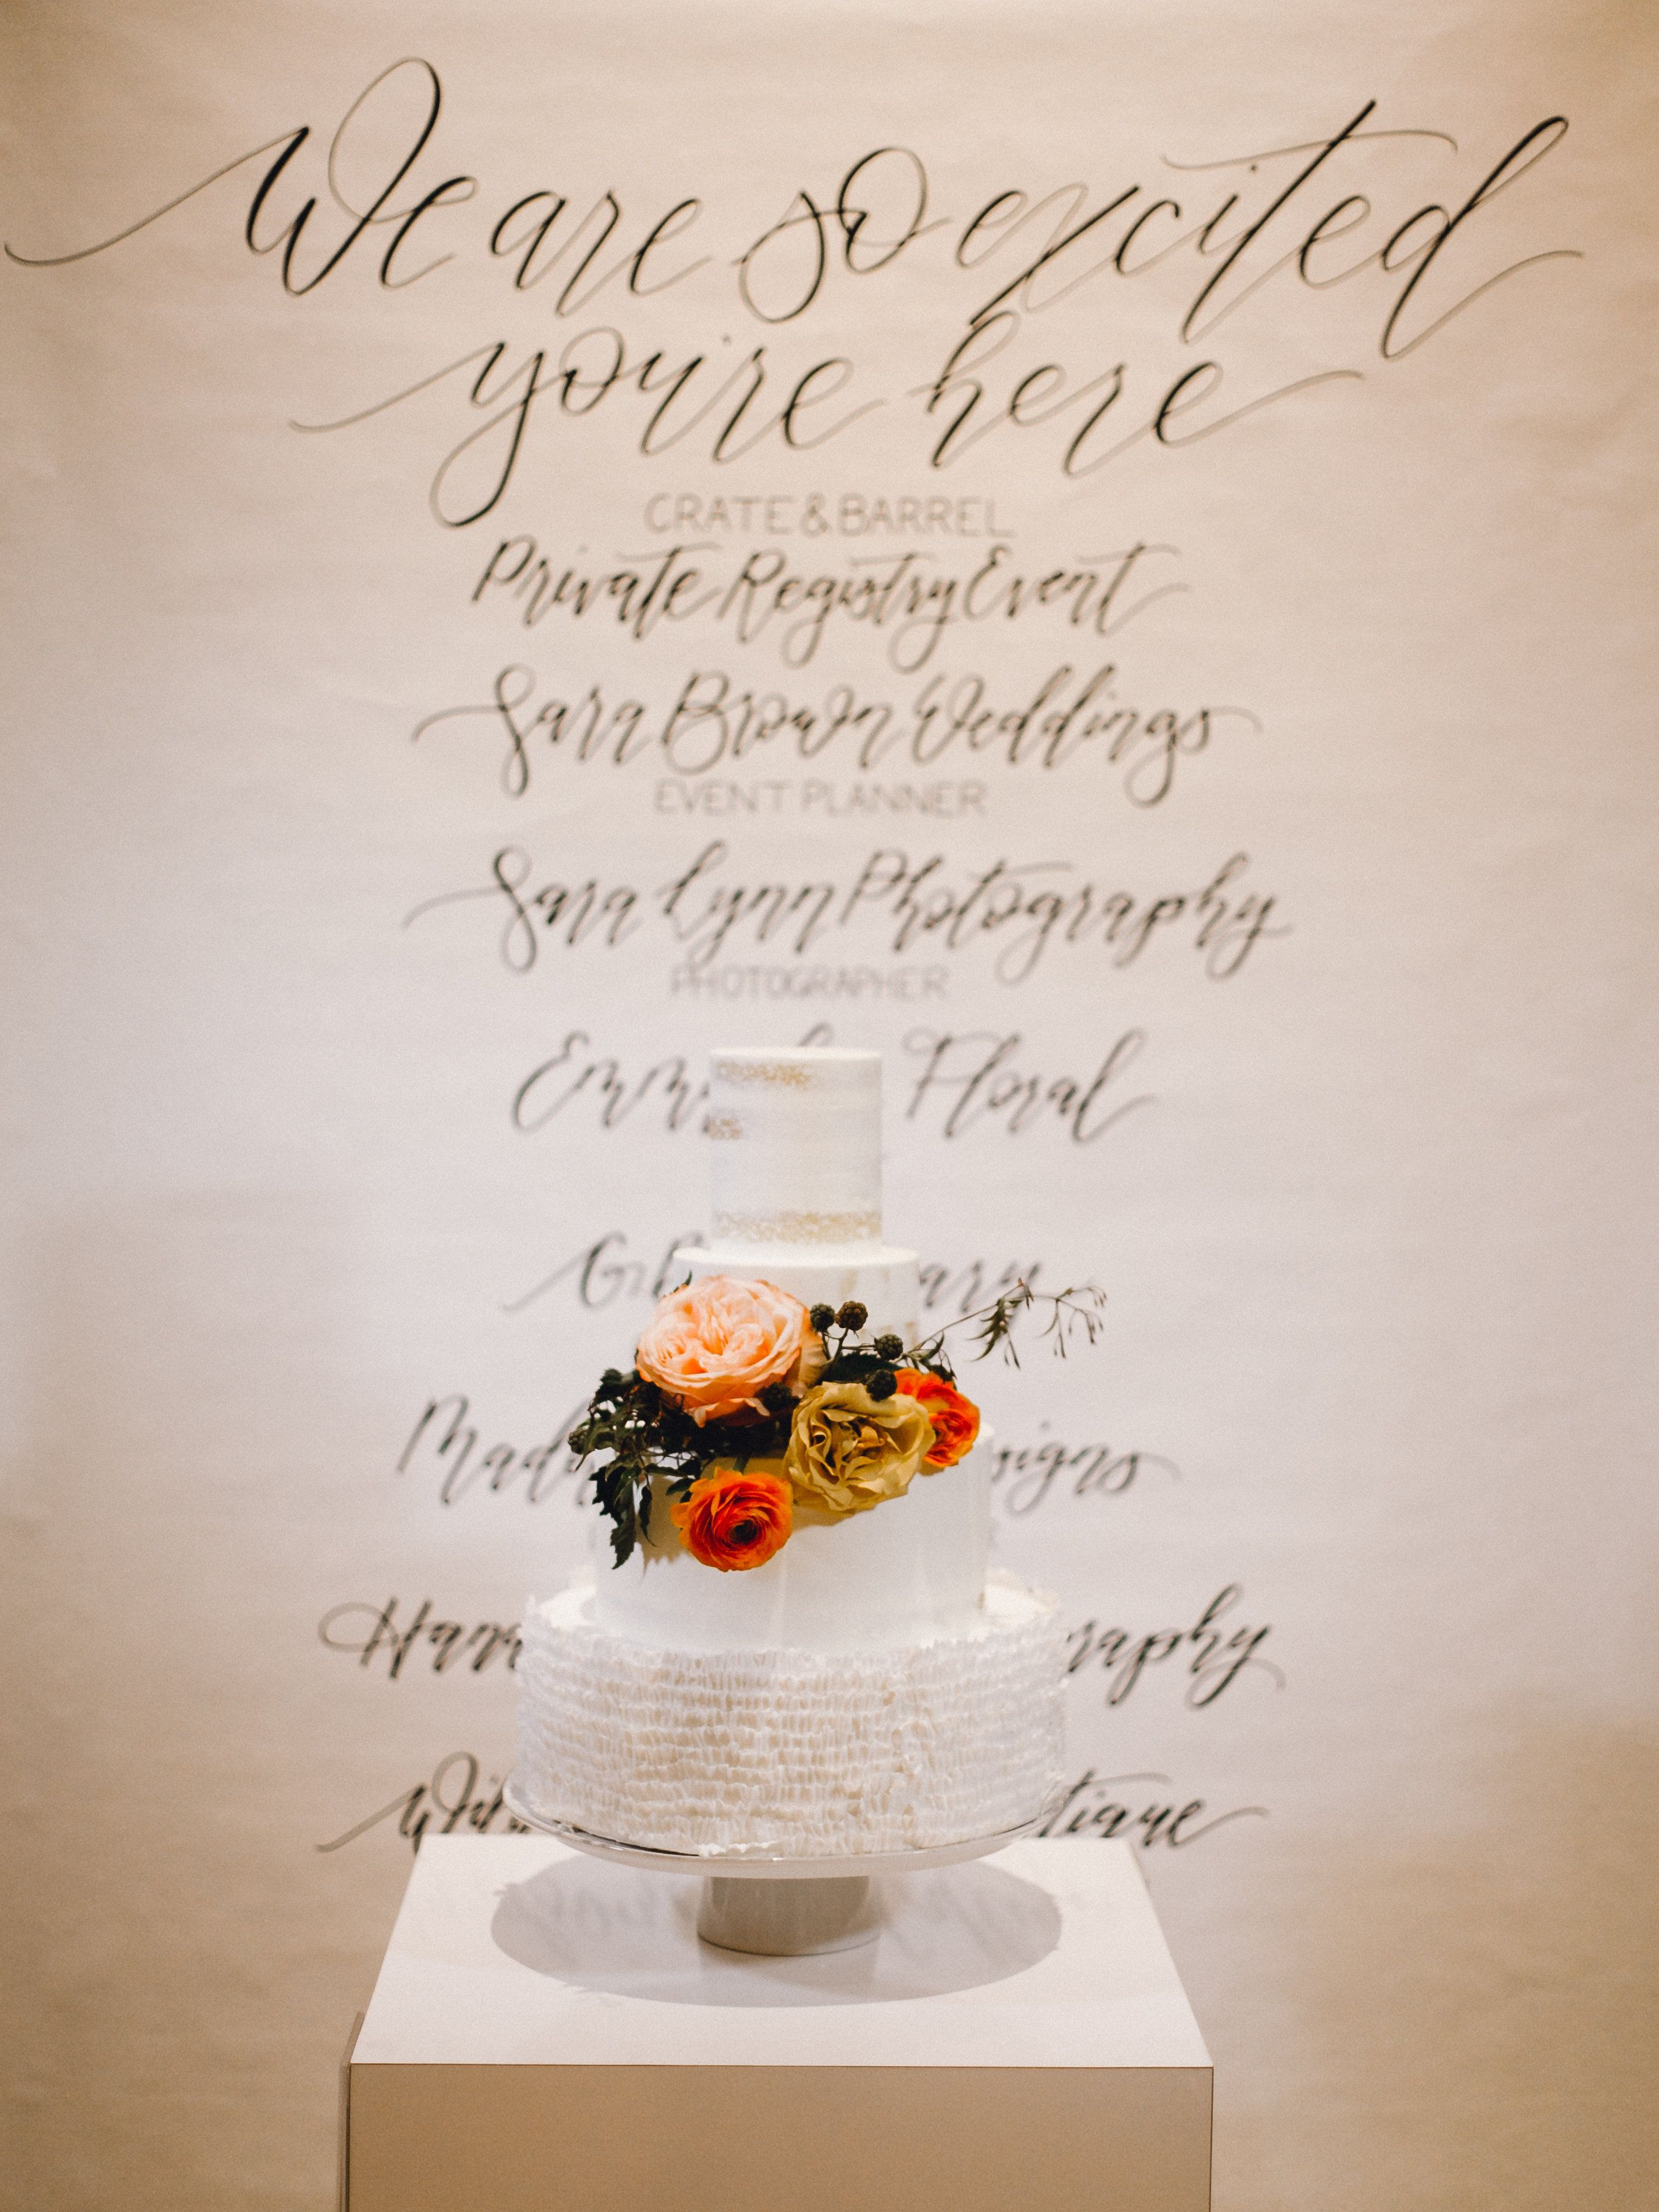 Wedding decorations stage backdrops october 2018 Custom Wedding Backdrop behind weddings cake  Crate u Barrel Event